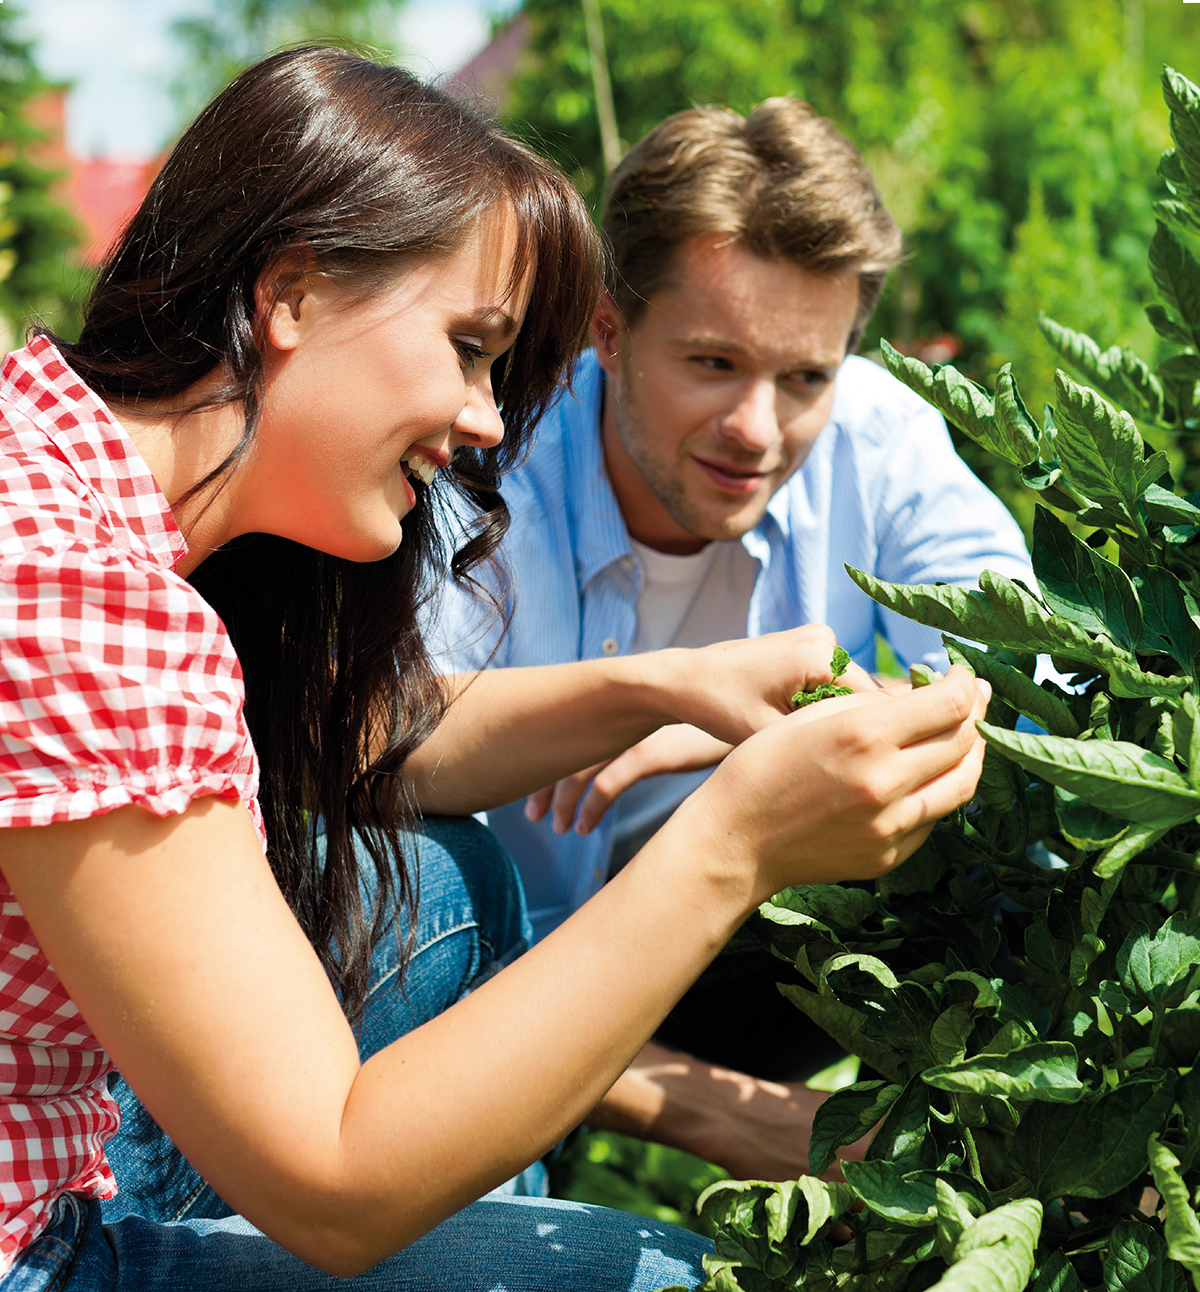 Teandances-2016-faire-realiser-soi-meme-jardin-agriculture-urbaine